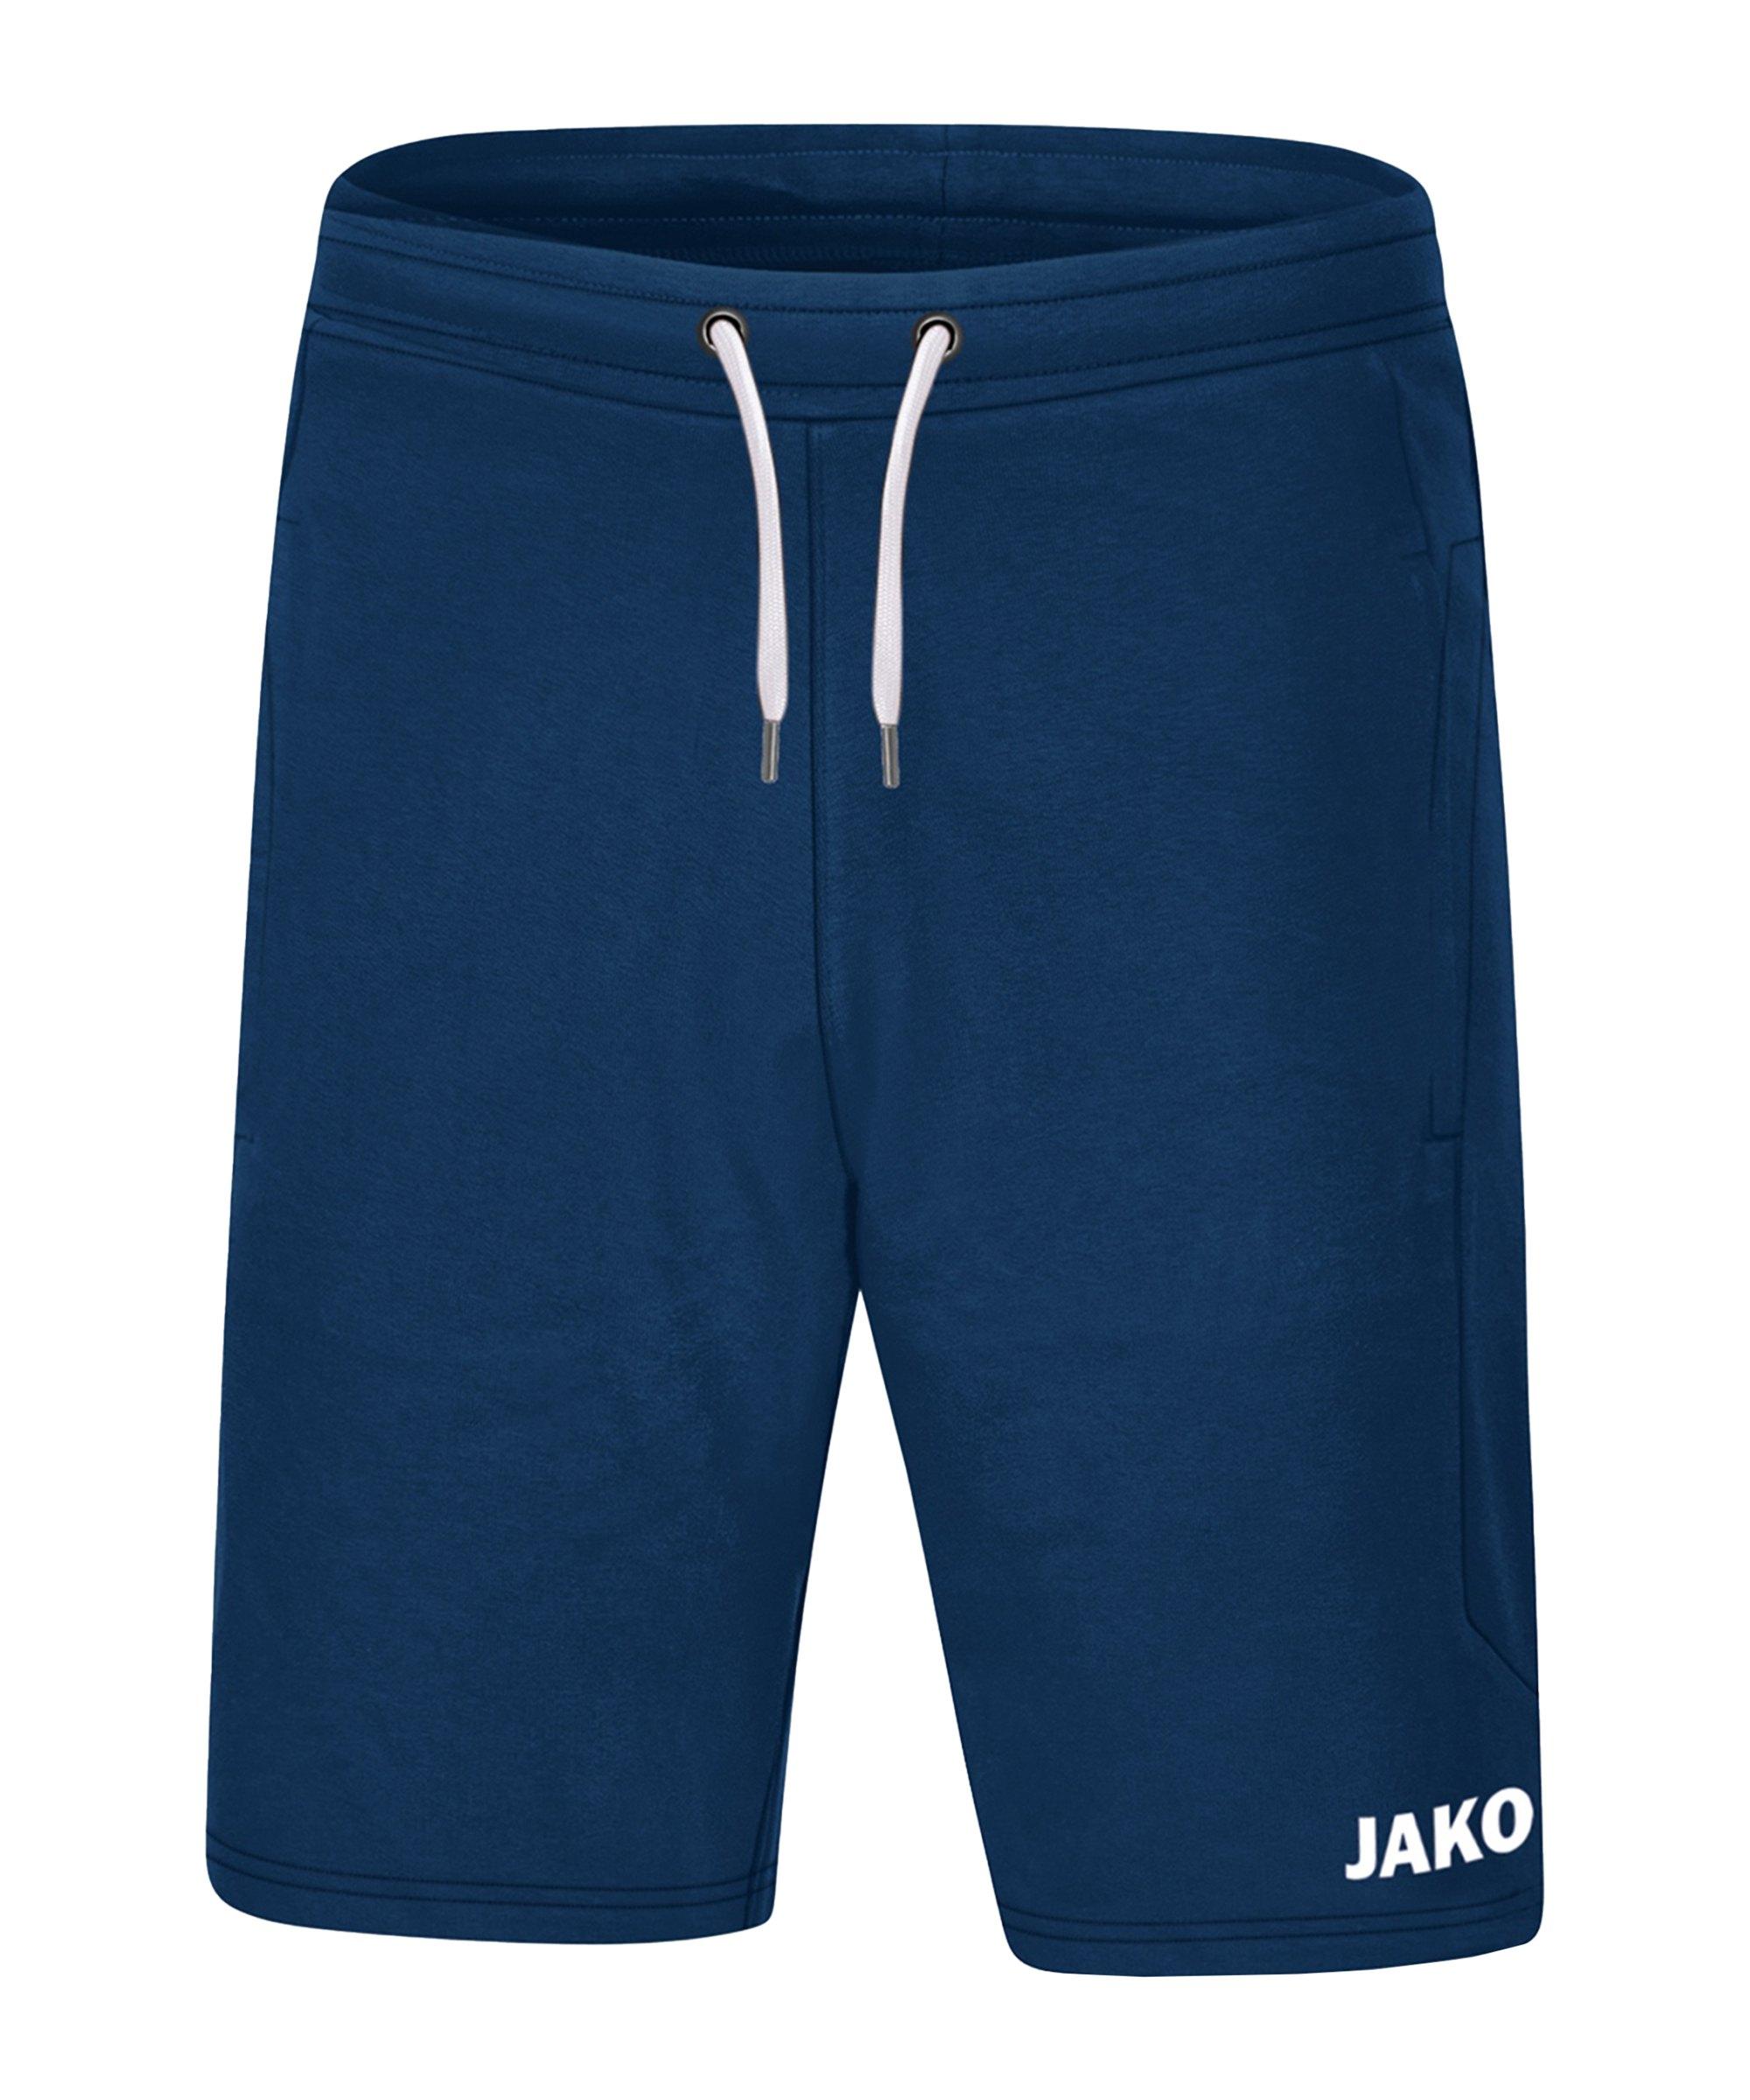 JAKO Base Short Kids Blau F09 - blau